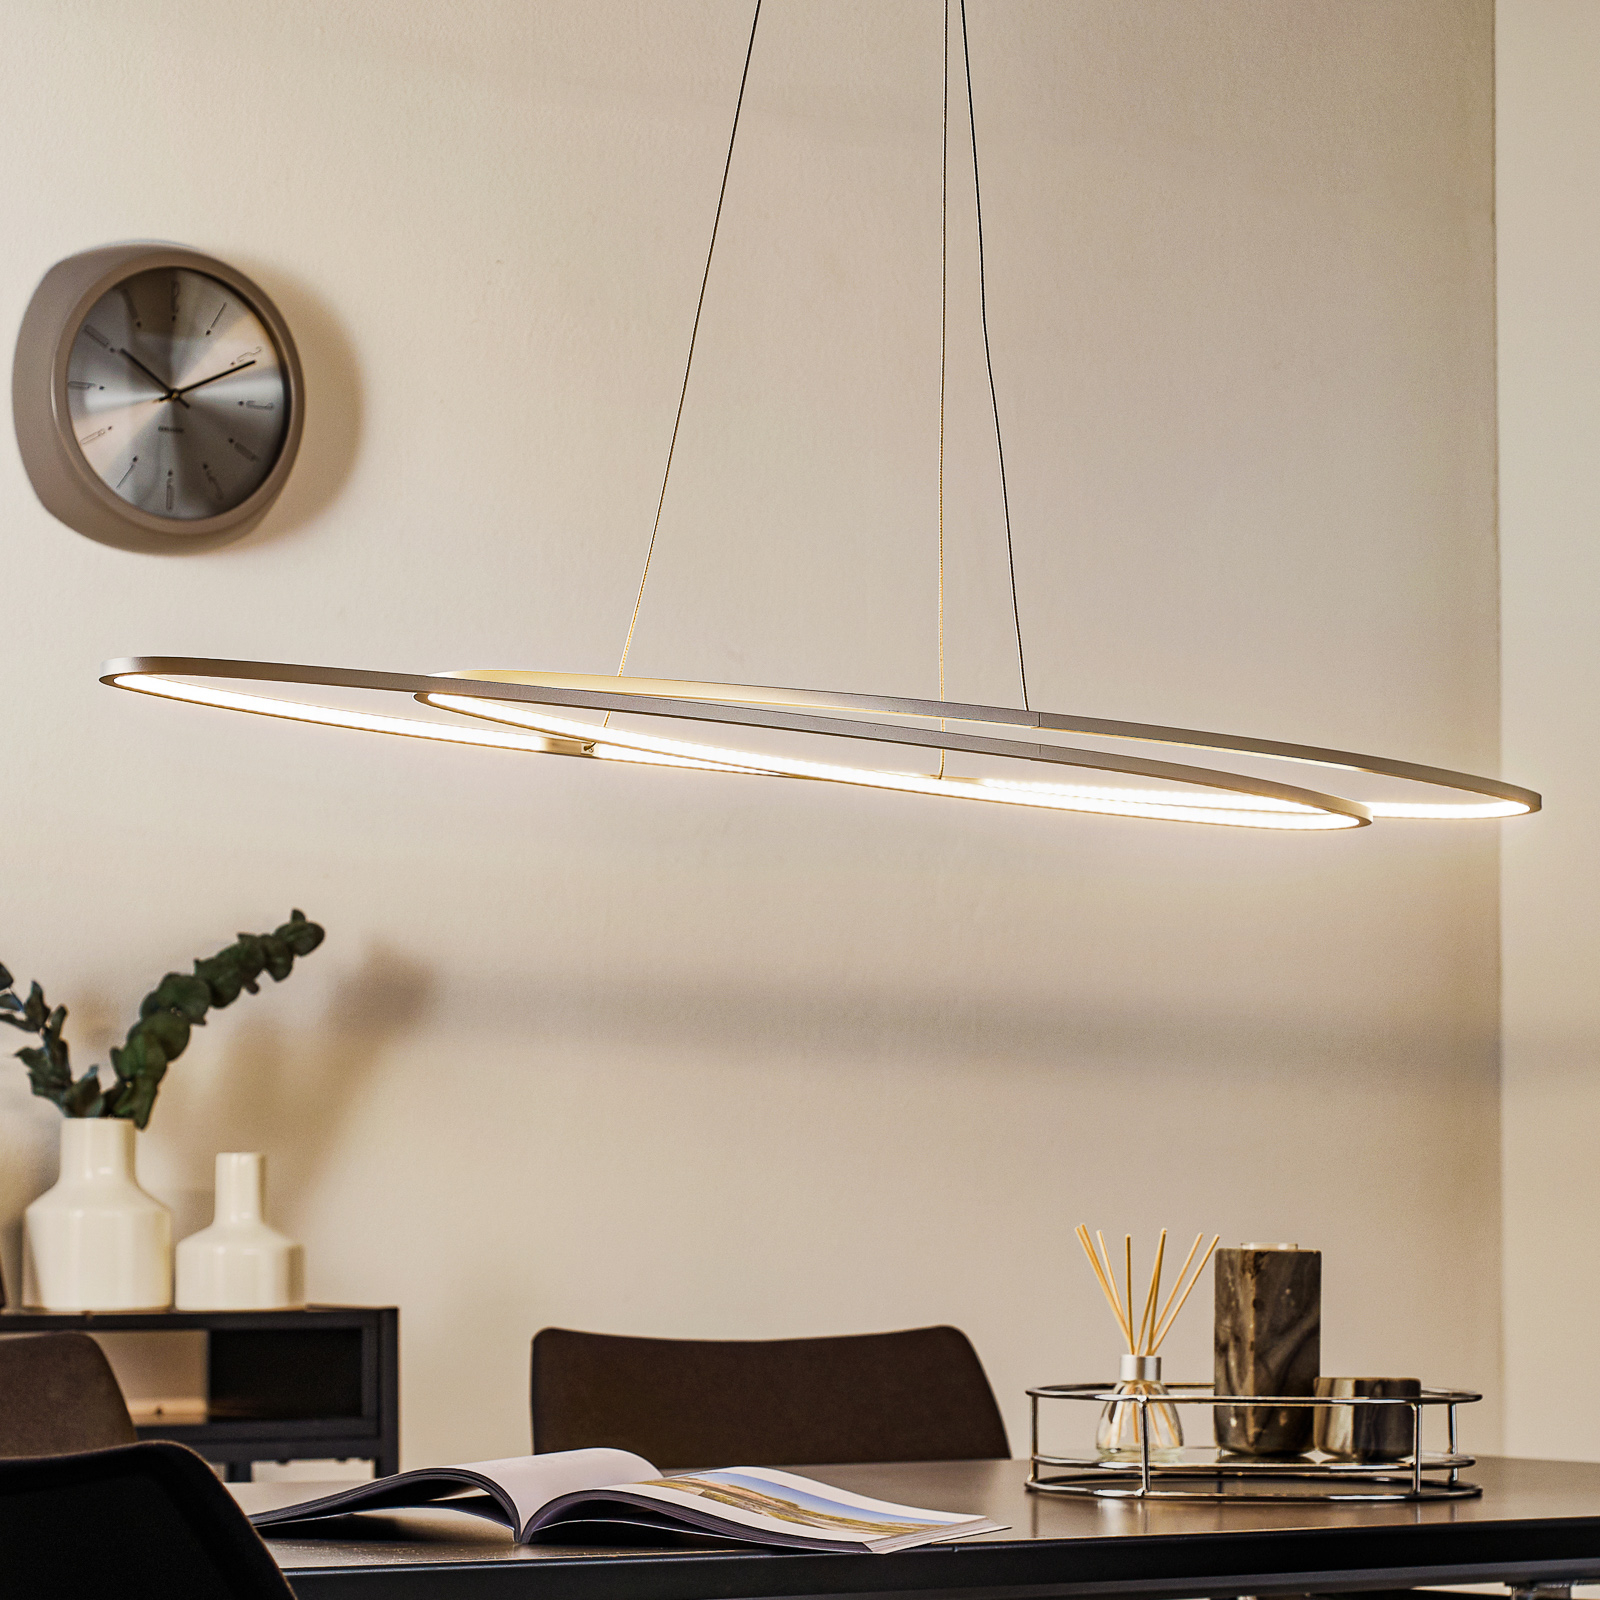 Bopp Flair - ovale LED-Hängeleuchte, alu